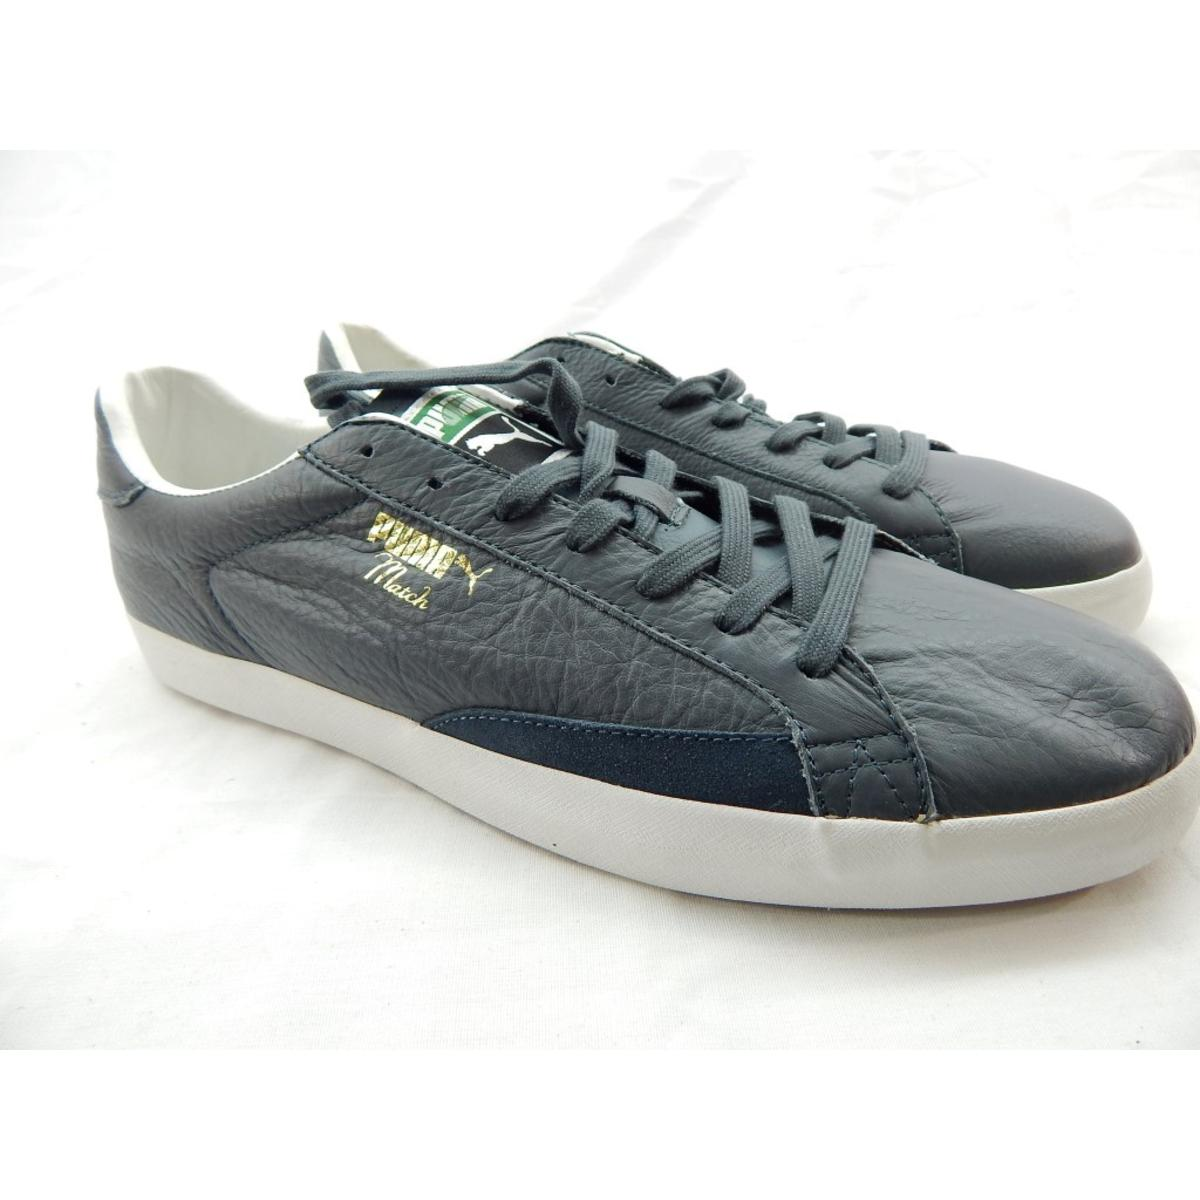 b521830da5cc62 Puma Match Vulc Gray Men s Fashion Sneakers 13M